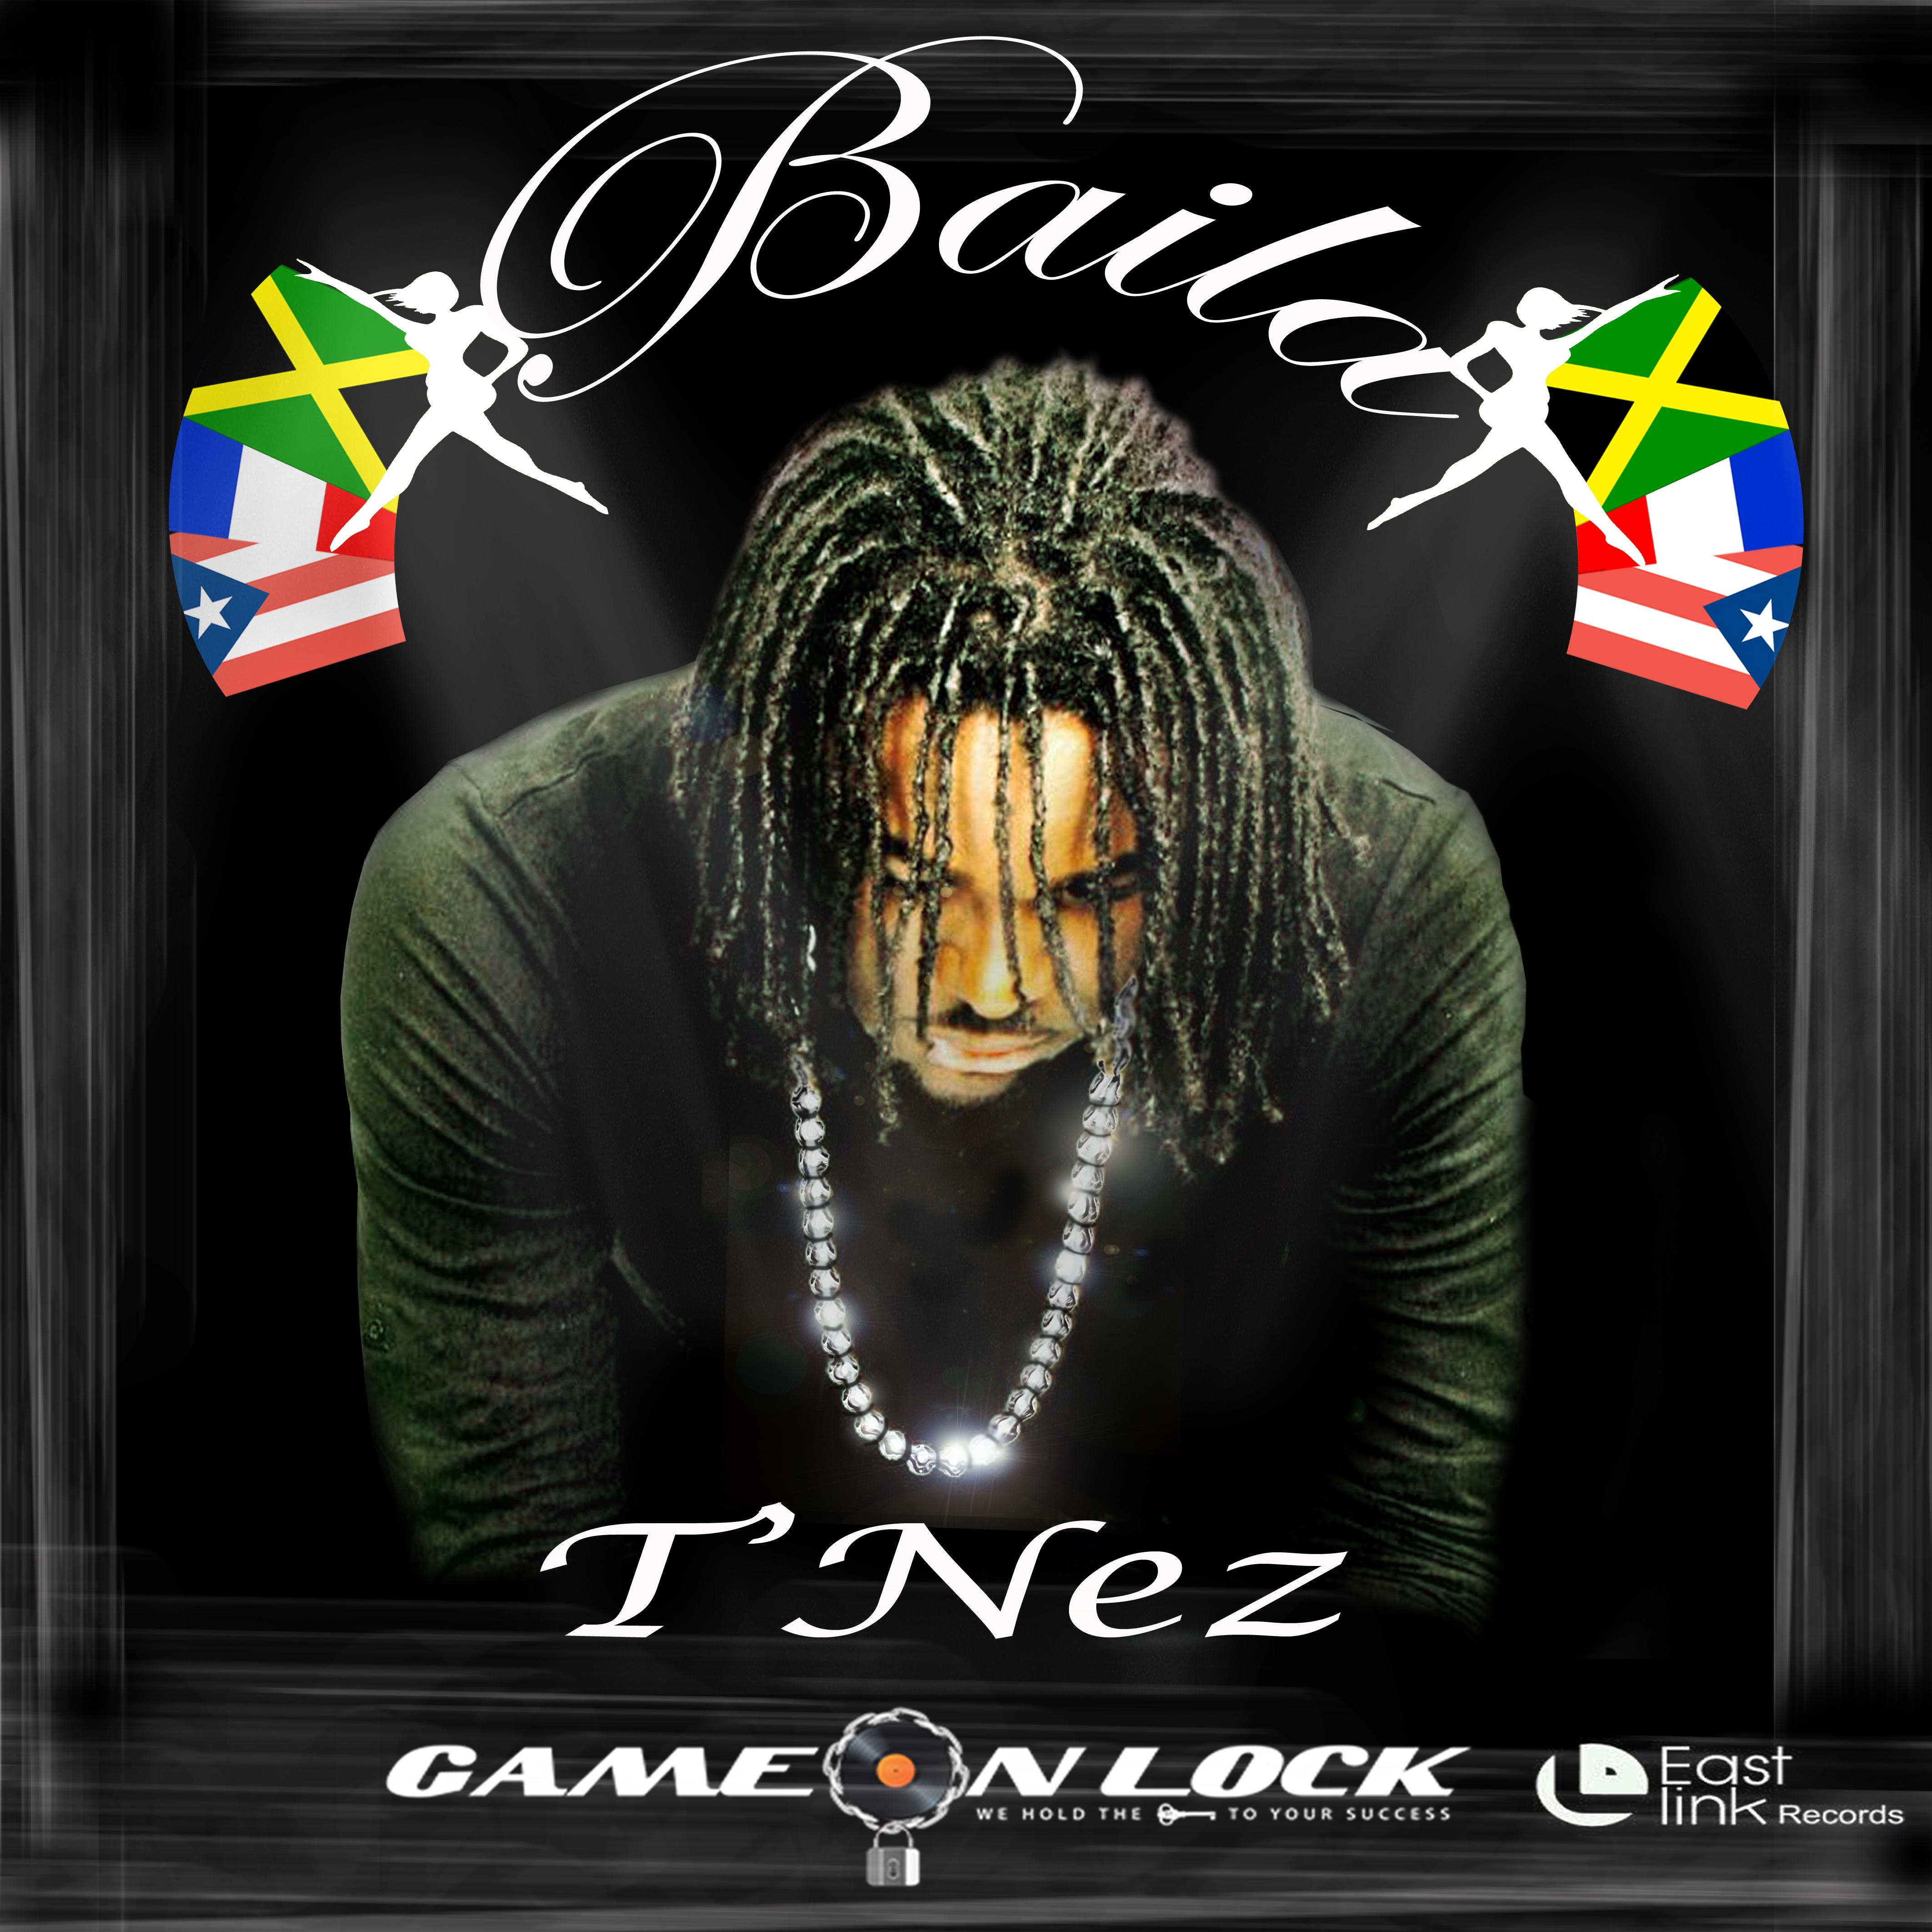 TNEZ-BAILA-EAST-LINK-RECORDS-COVER